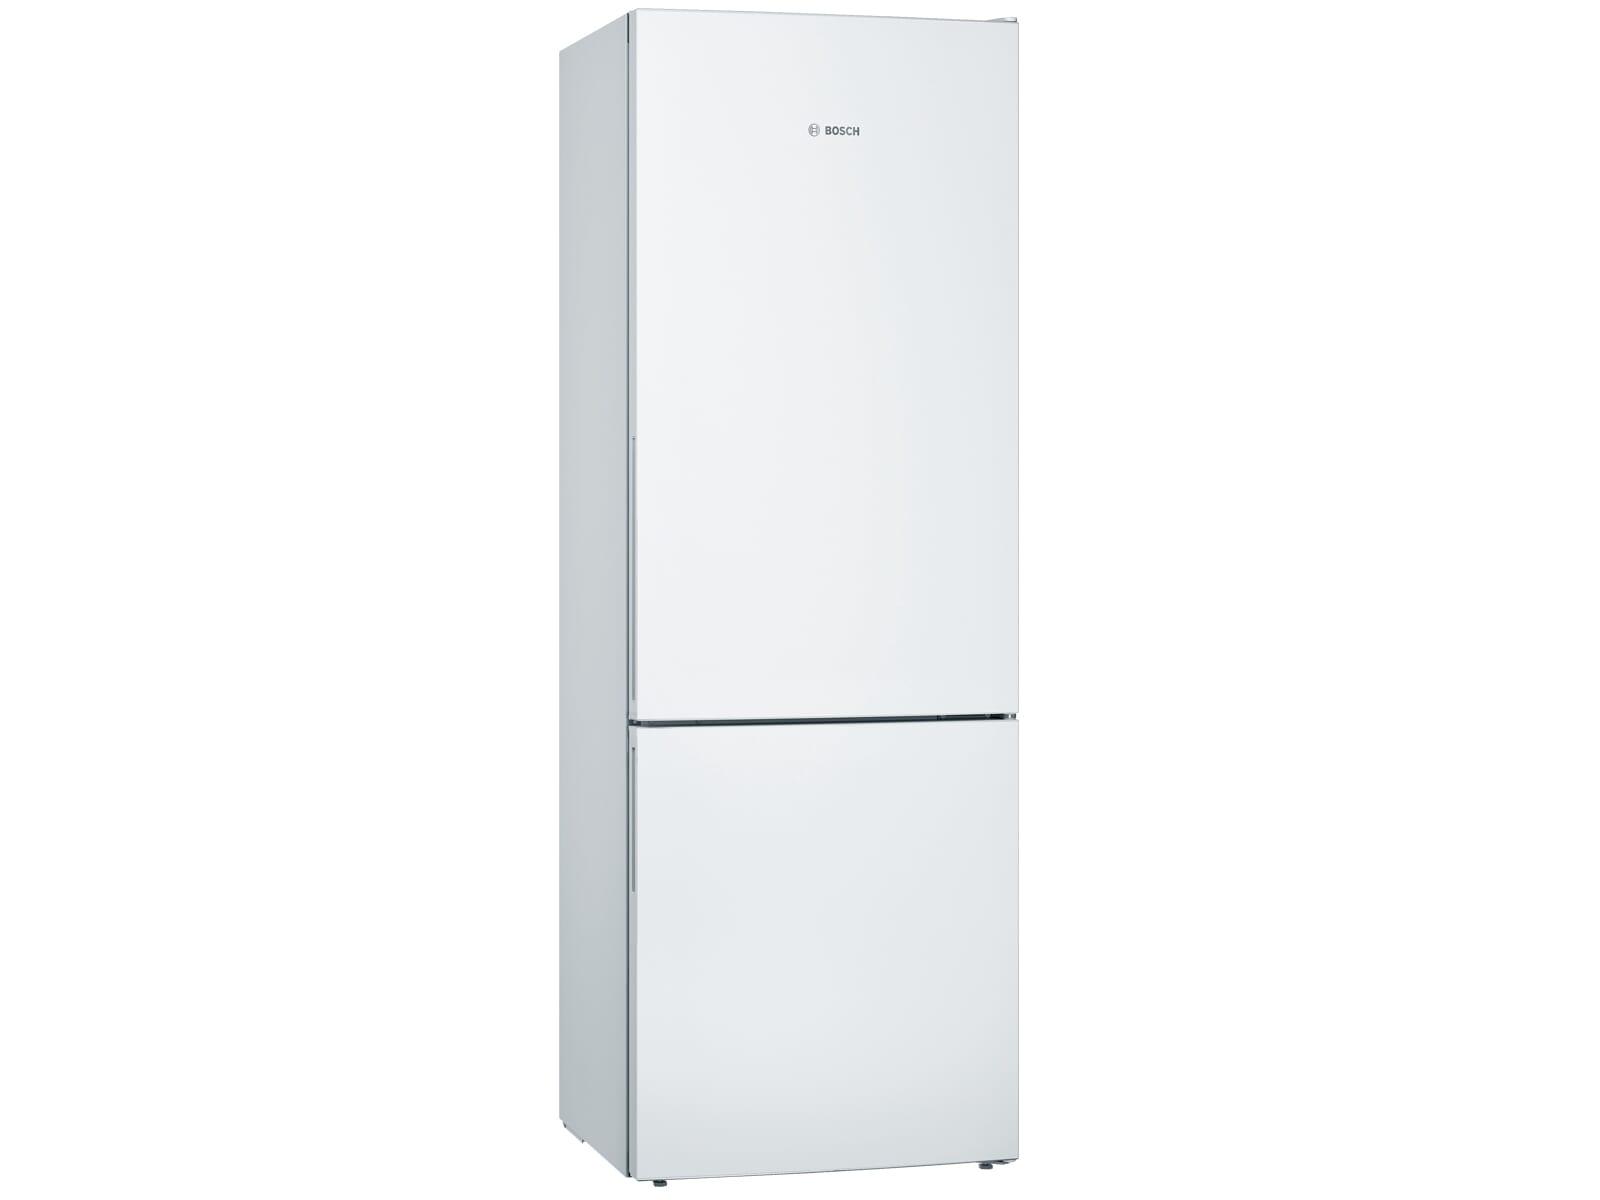 Bosch KGE49AWCA Kühl-Gefrier-Kombination Weiß